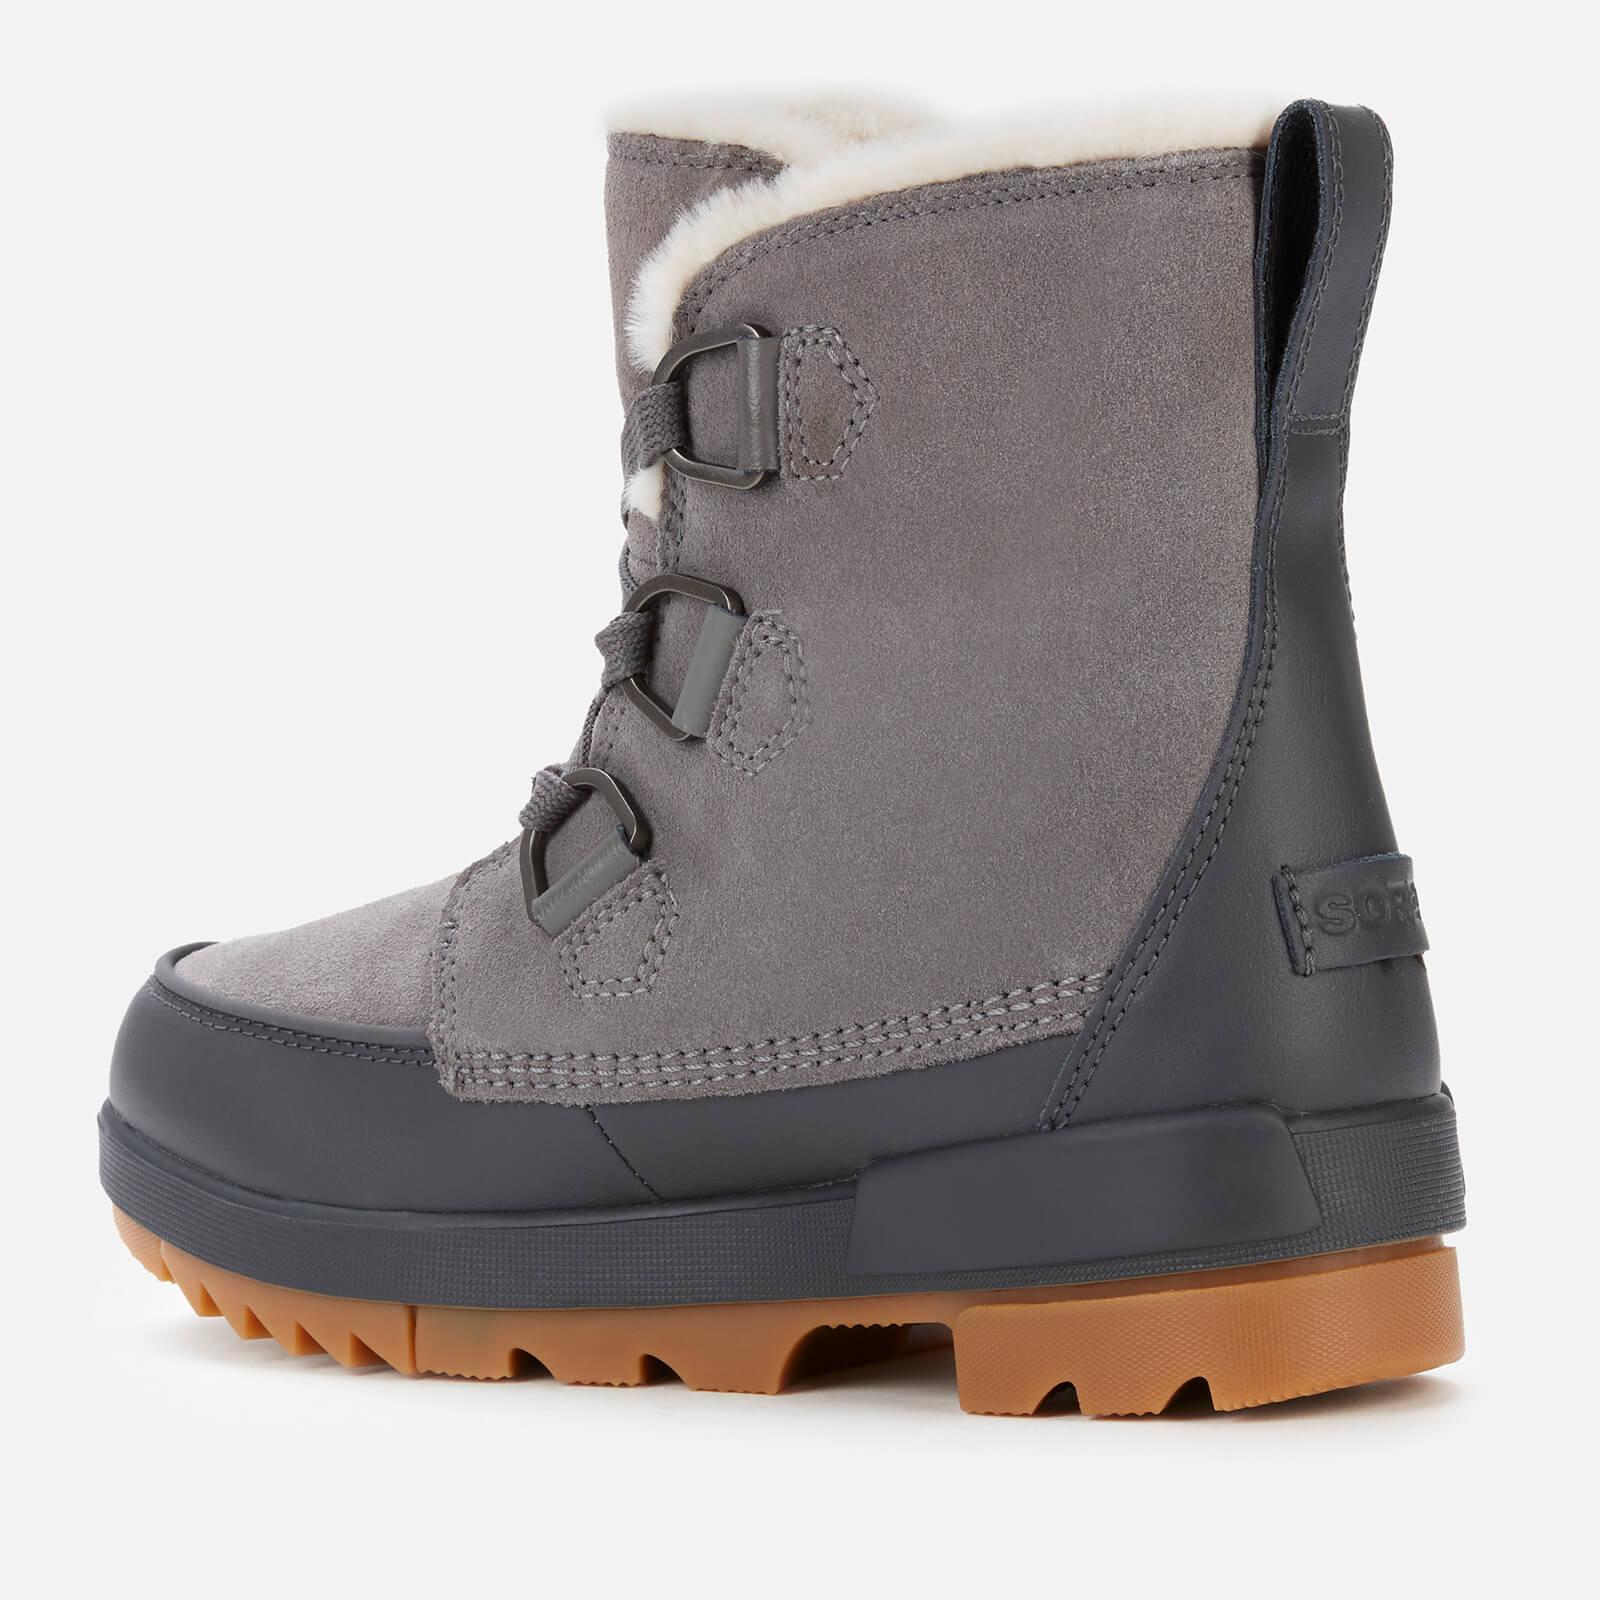 Sorel Women's Torino Ii Waterproof Suede Shell Boots - Quarry - Uk 3